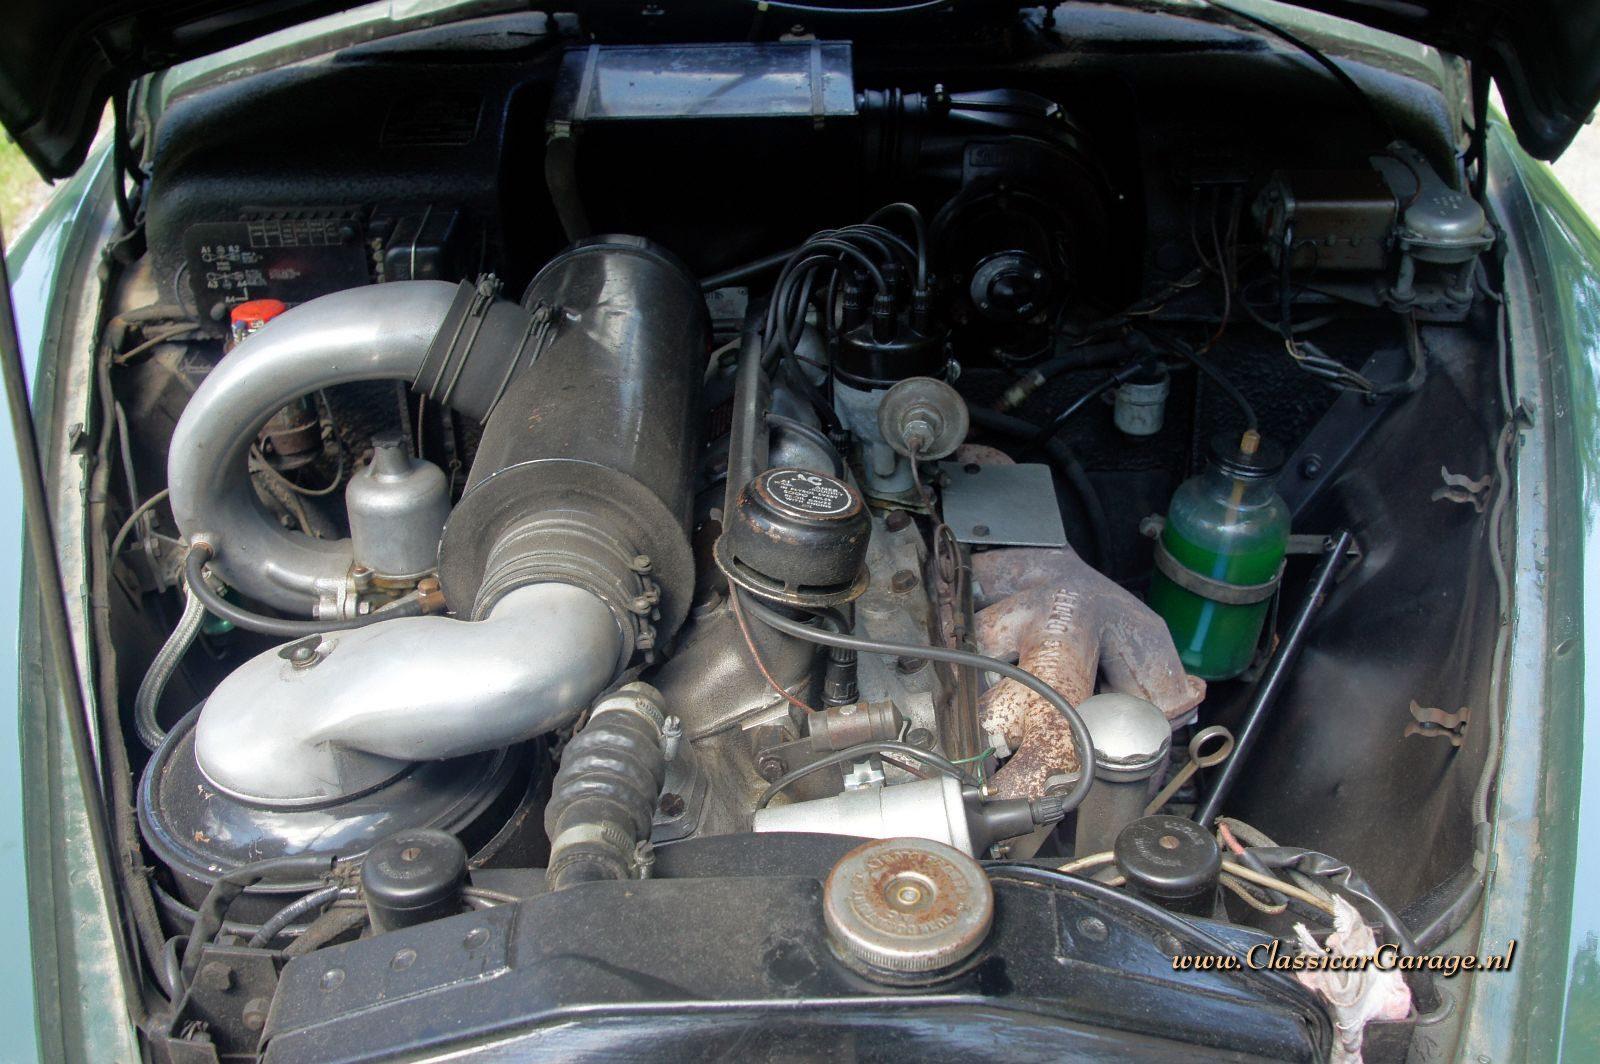 Car All Parts Details